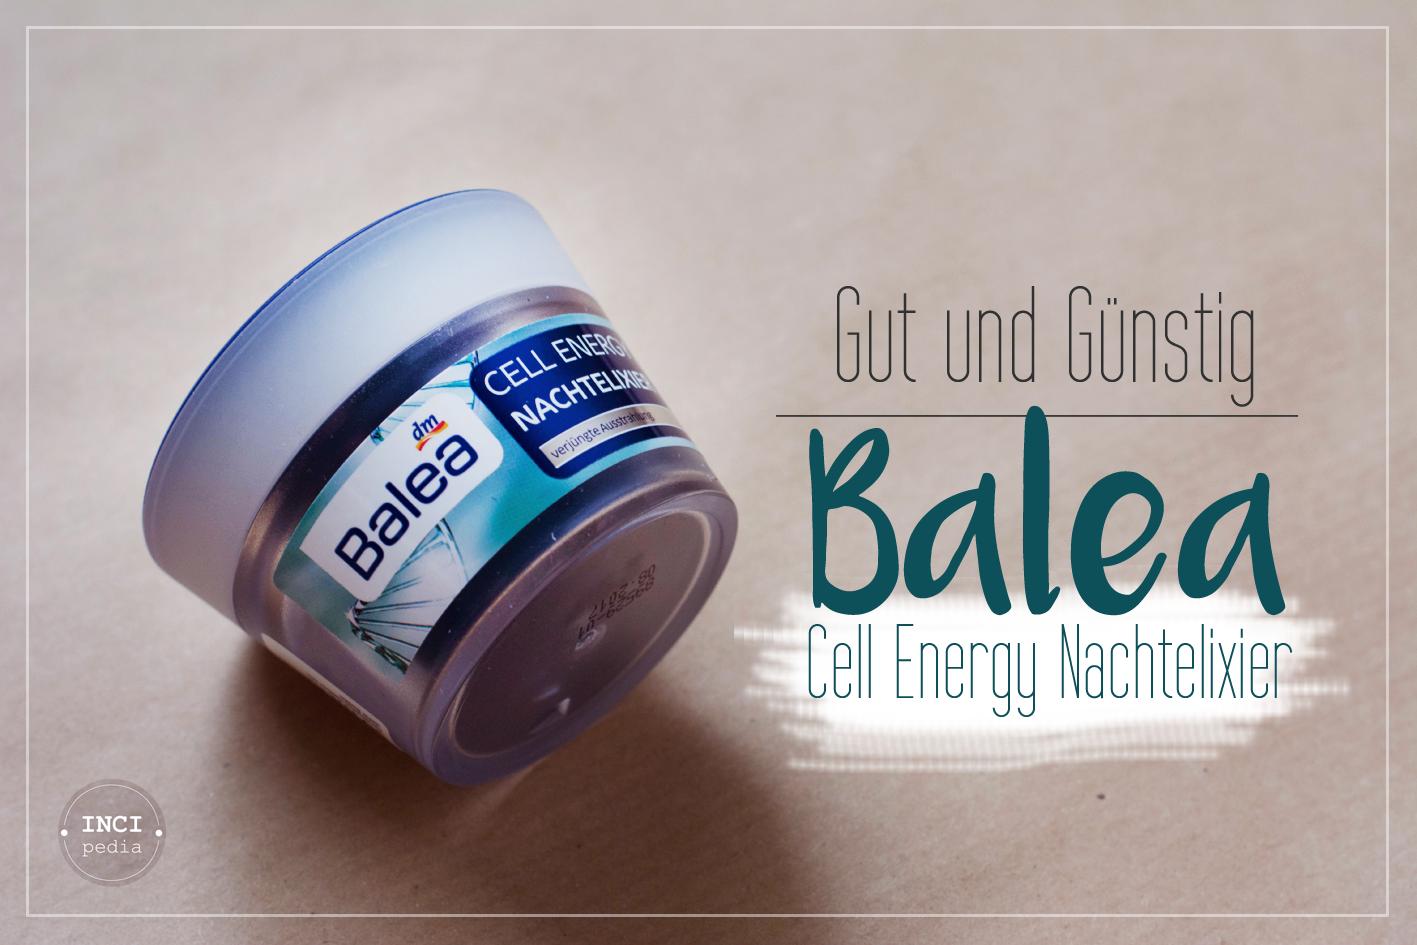 balea_cell_energy